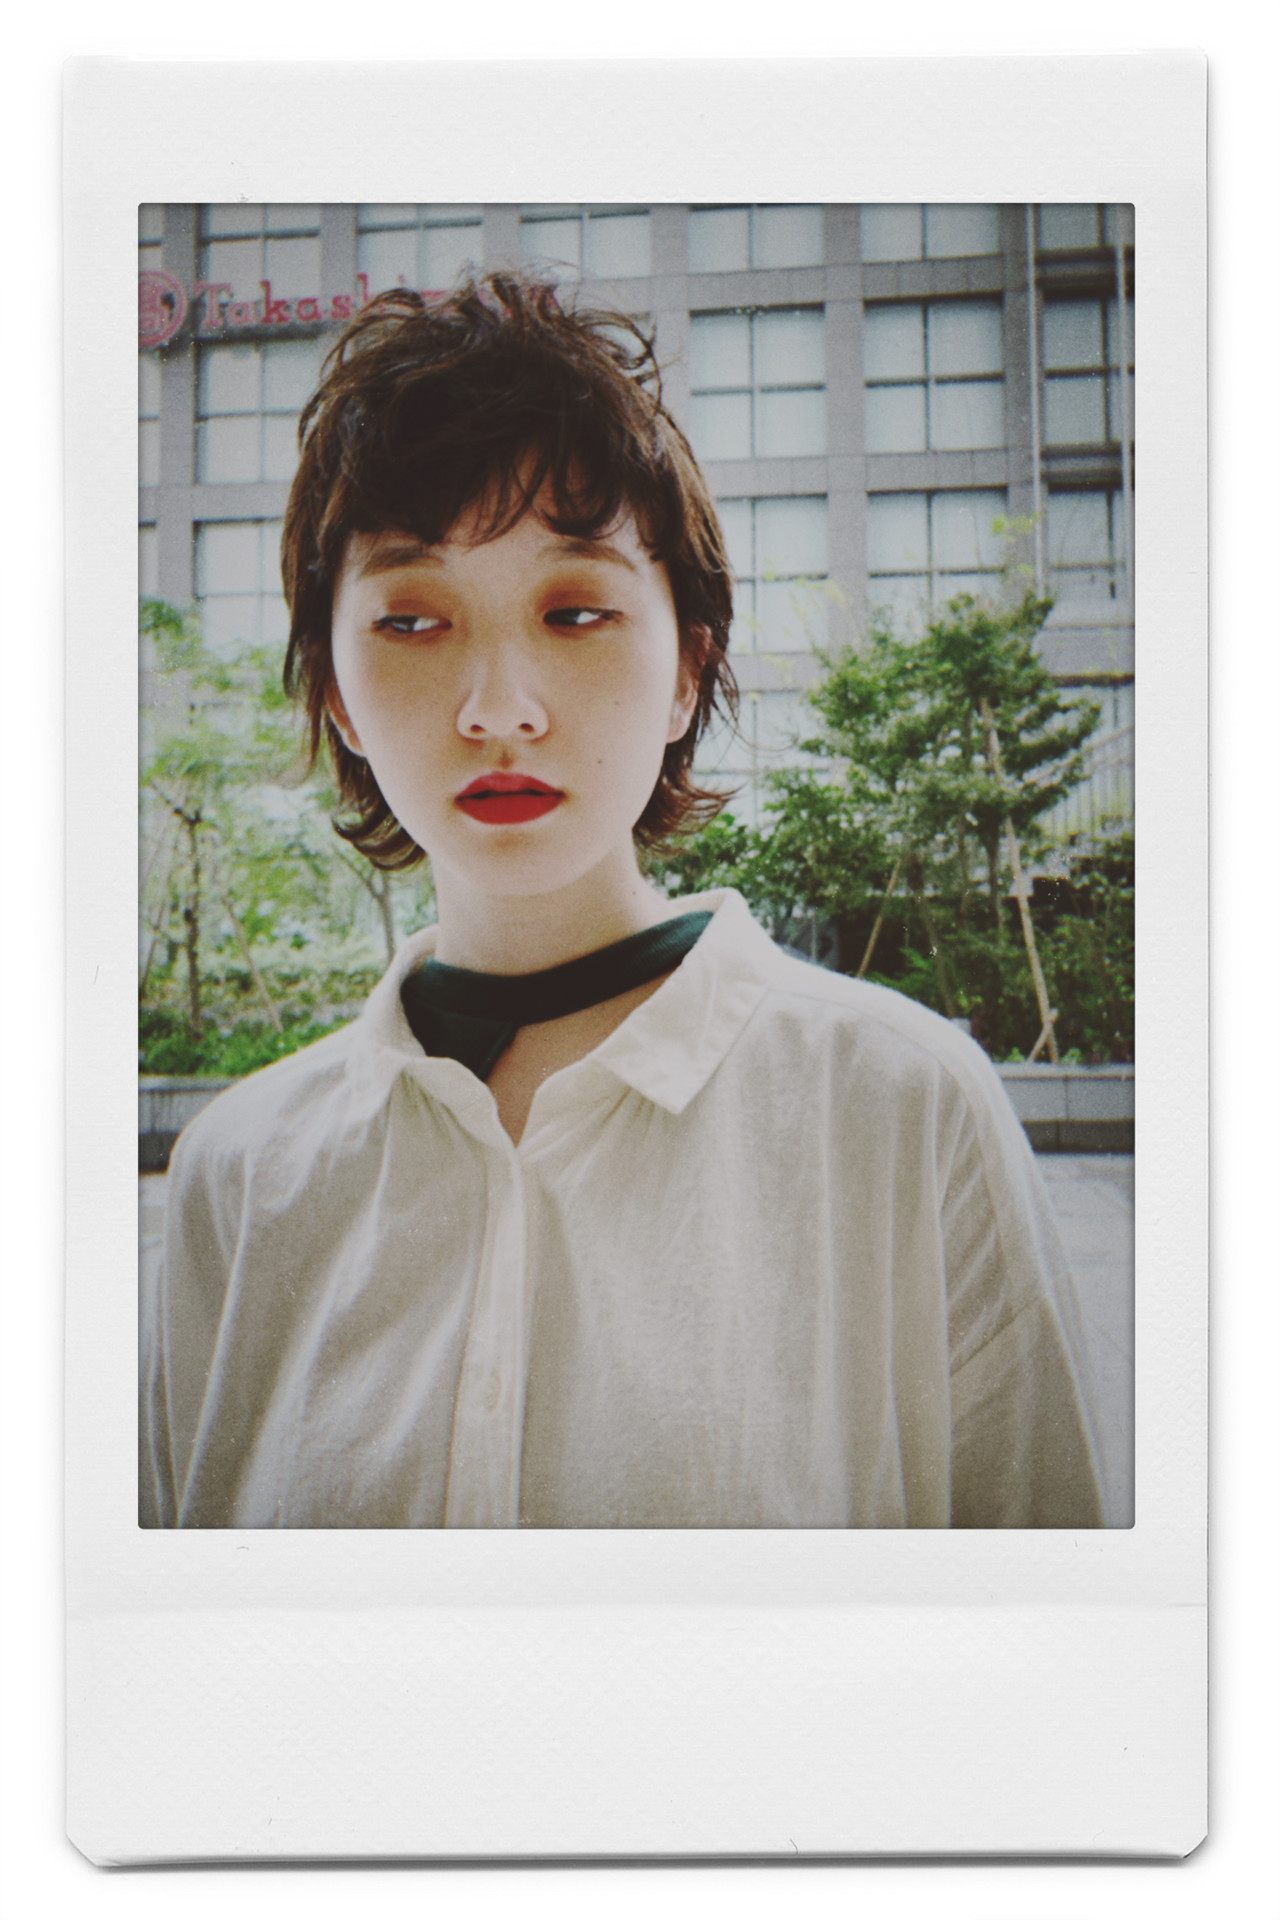 PEEK-A-BOO ショート ウルフカット 似合わせカット ヘアスタイルや髪型の写真・画像 | 阿藤俊也 / PEEK-A-BOO NEWoMan新宿